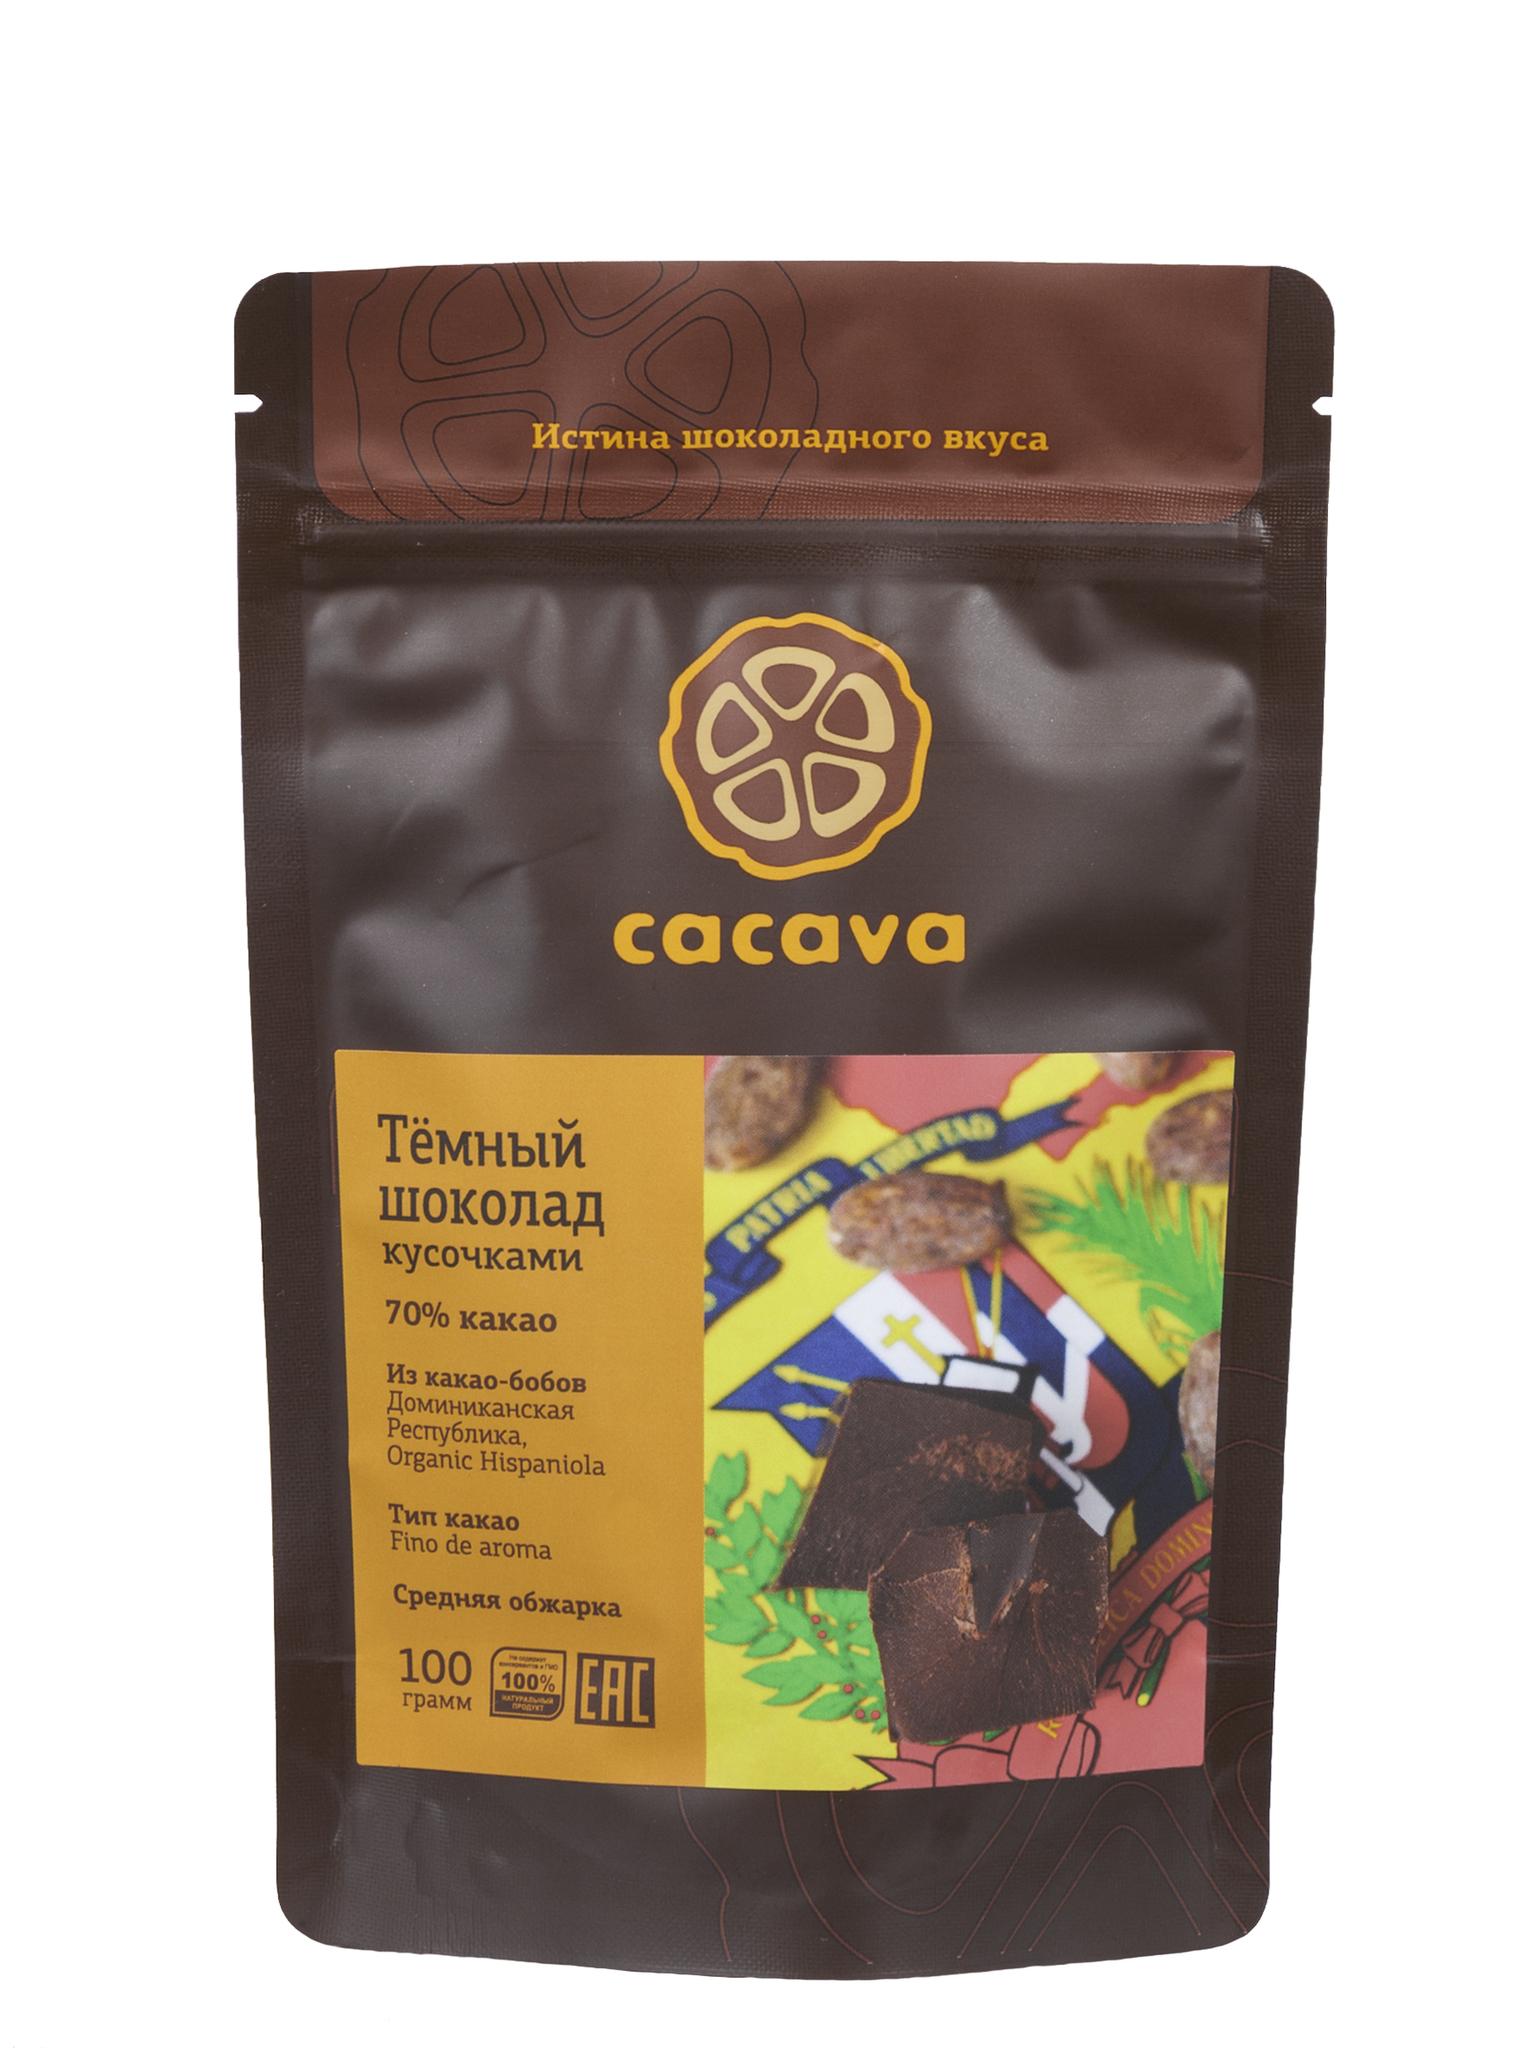 Тёмный шоколад 70 % какао (Доминикана), упаковка 100 грамм